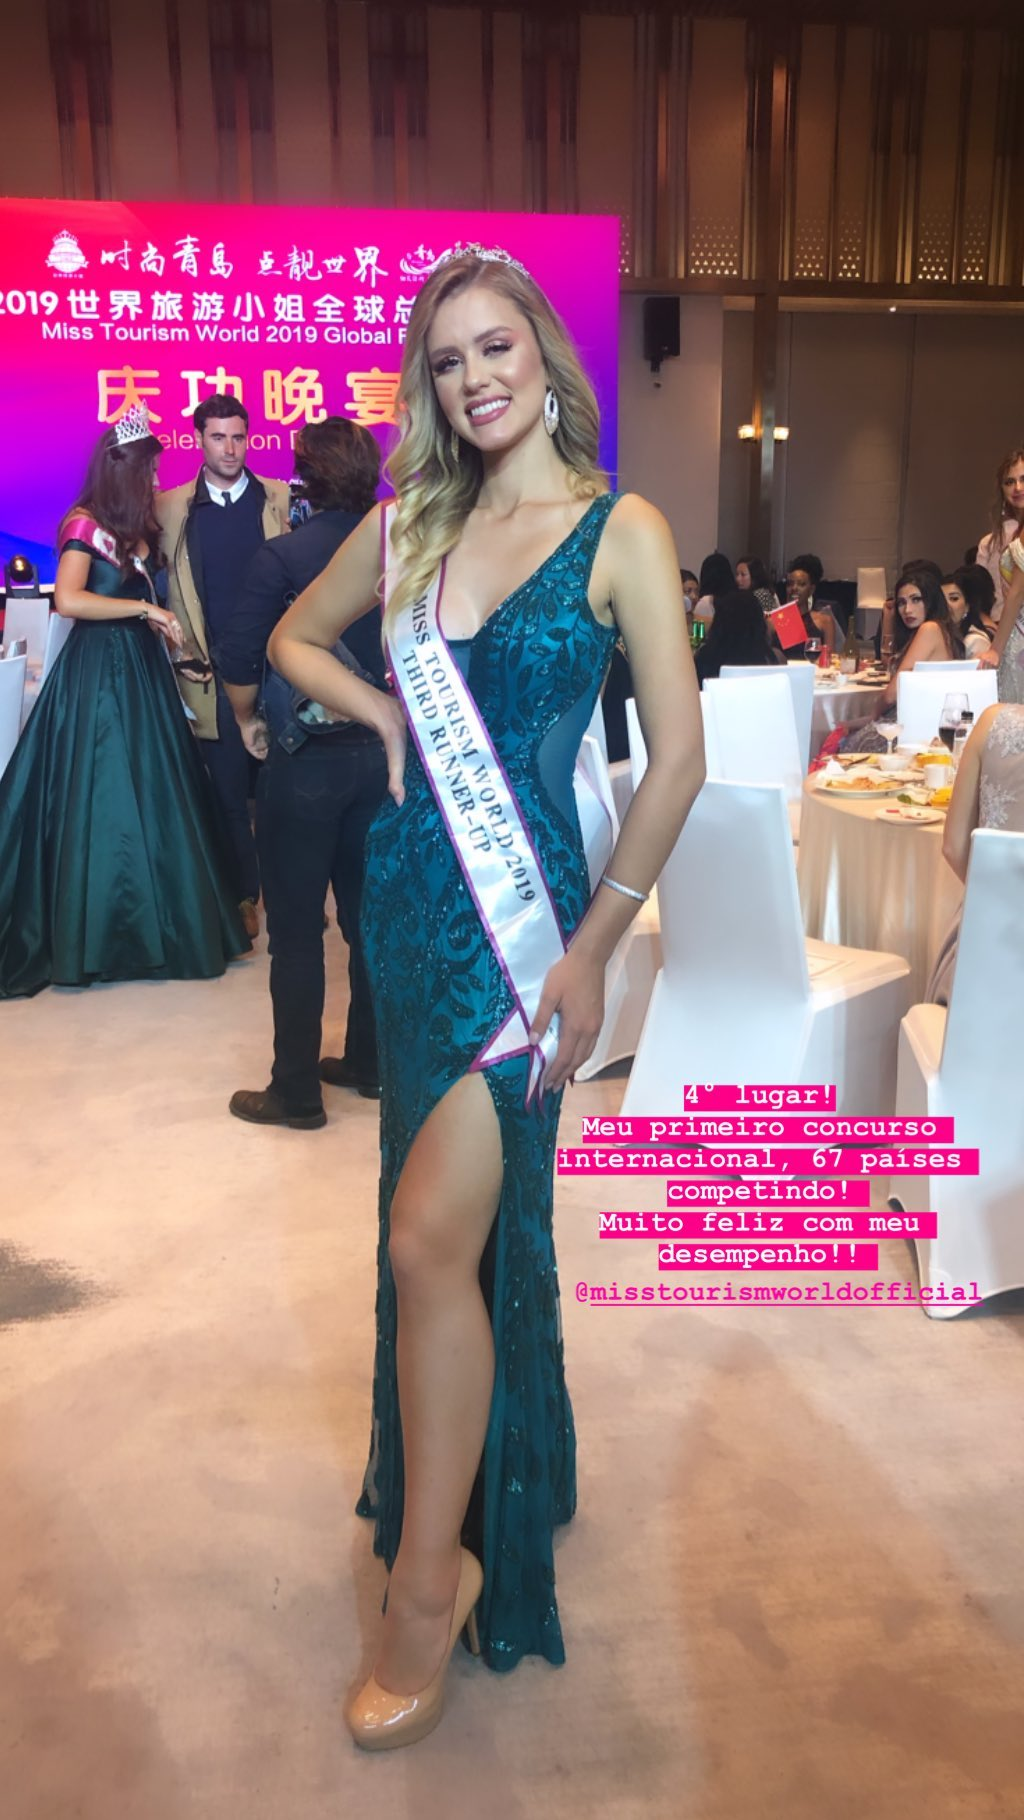 marcella kozinski de barros, 3rd runner-up de miss tourism world 2019. - Página 6 70558510